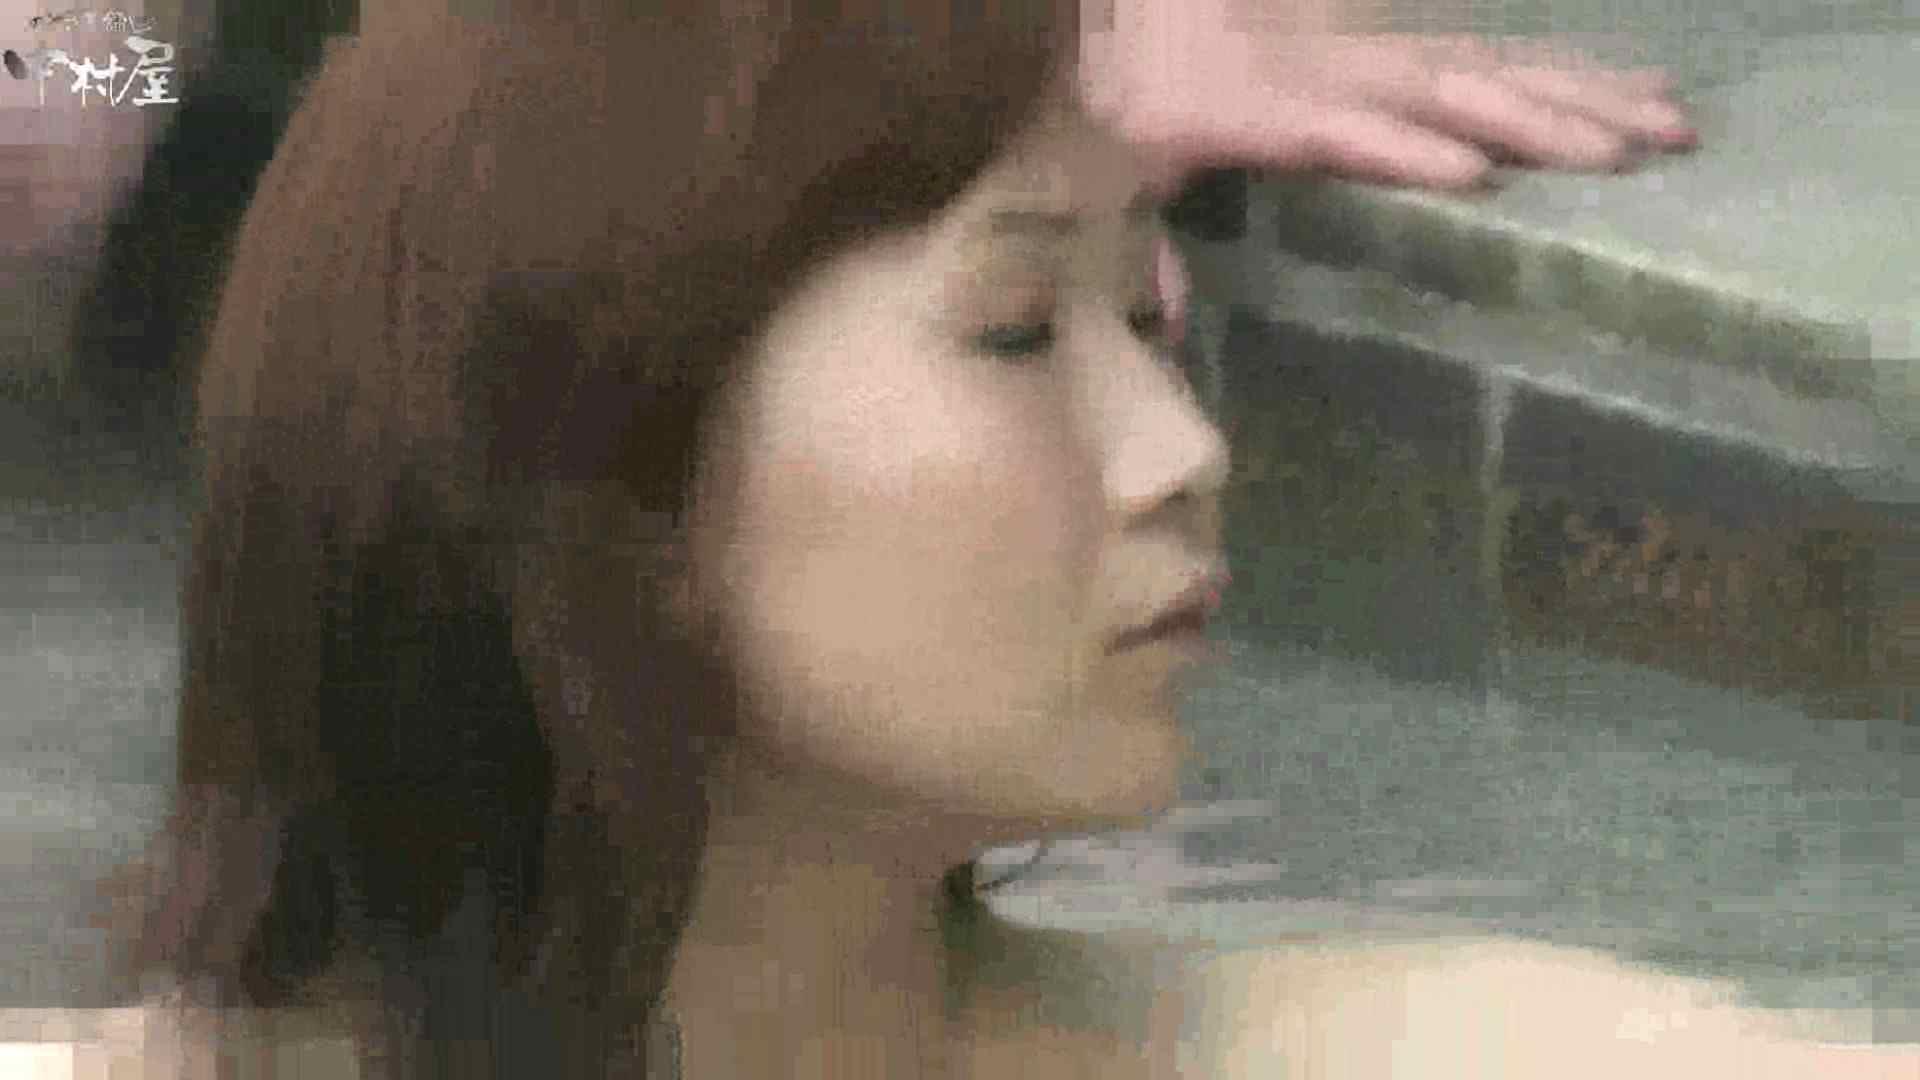 Aquaな露天風呂Vol.877潜入盗撮露天風呂十三判湯 其の二 潜入突撃  97pic 68